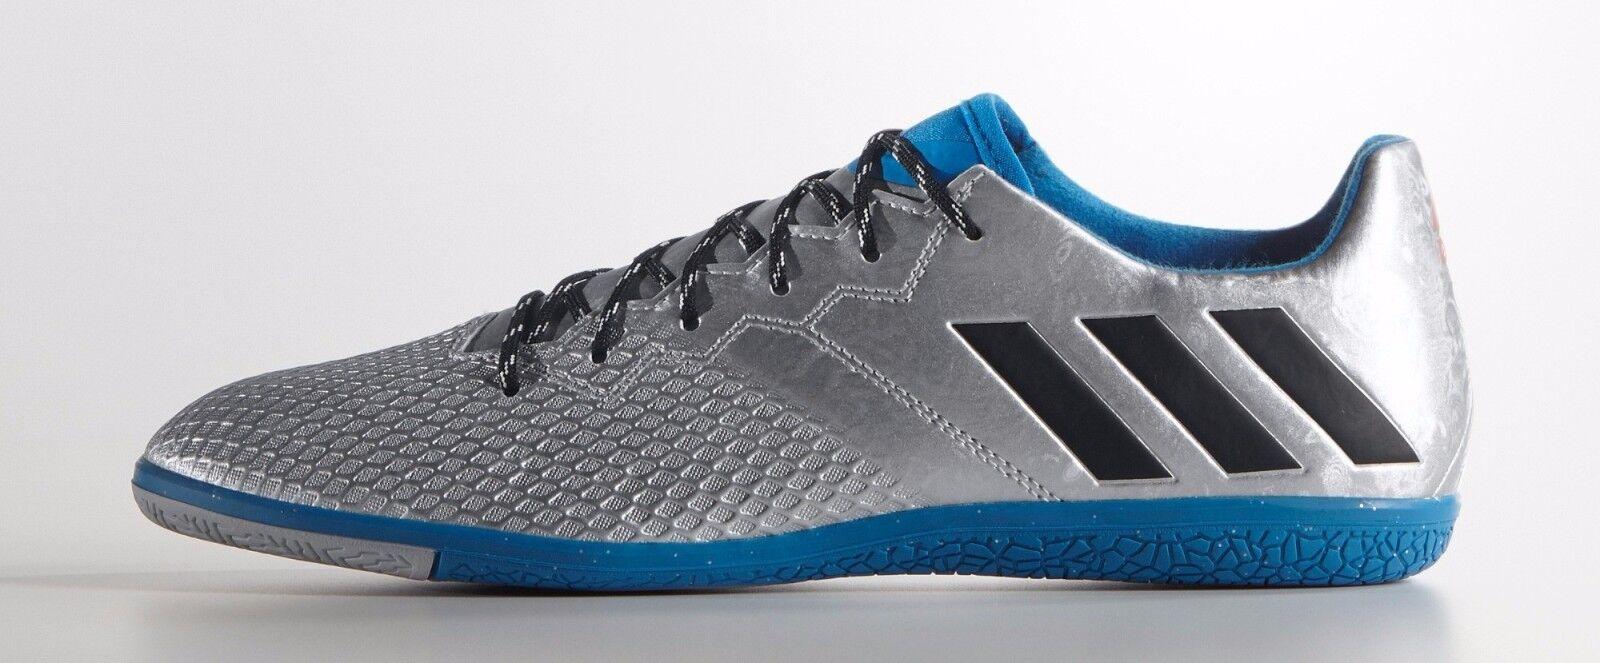 Adidas Messi 16.2 IC Indoor Men's Soccer Cleats Style S79635 MSRP  130